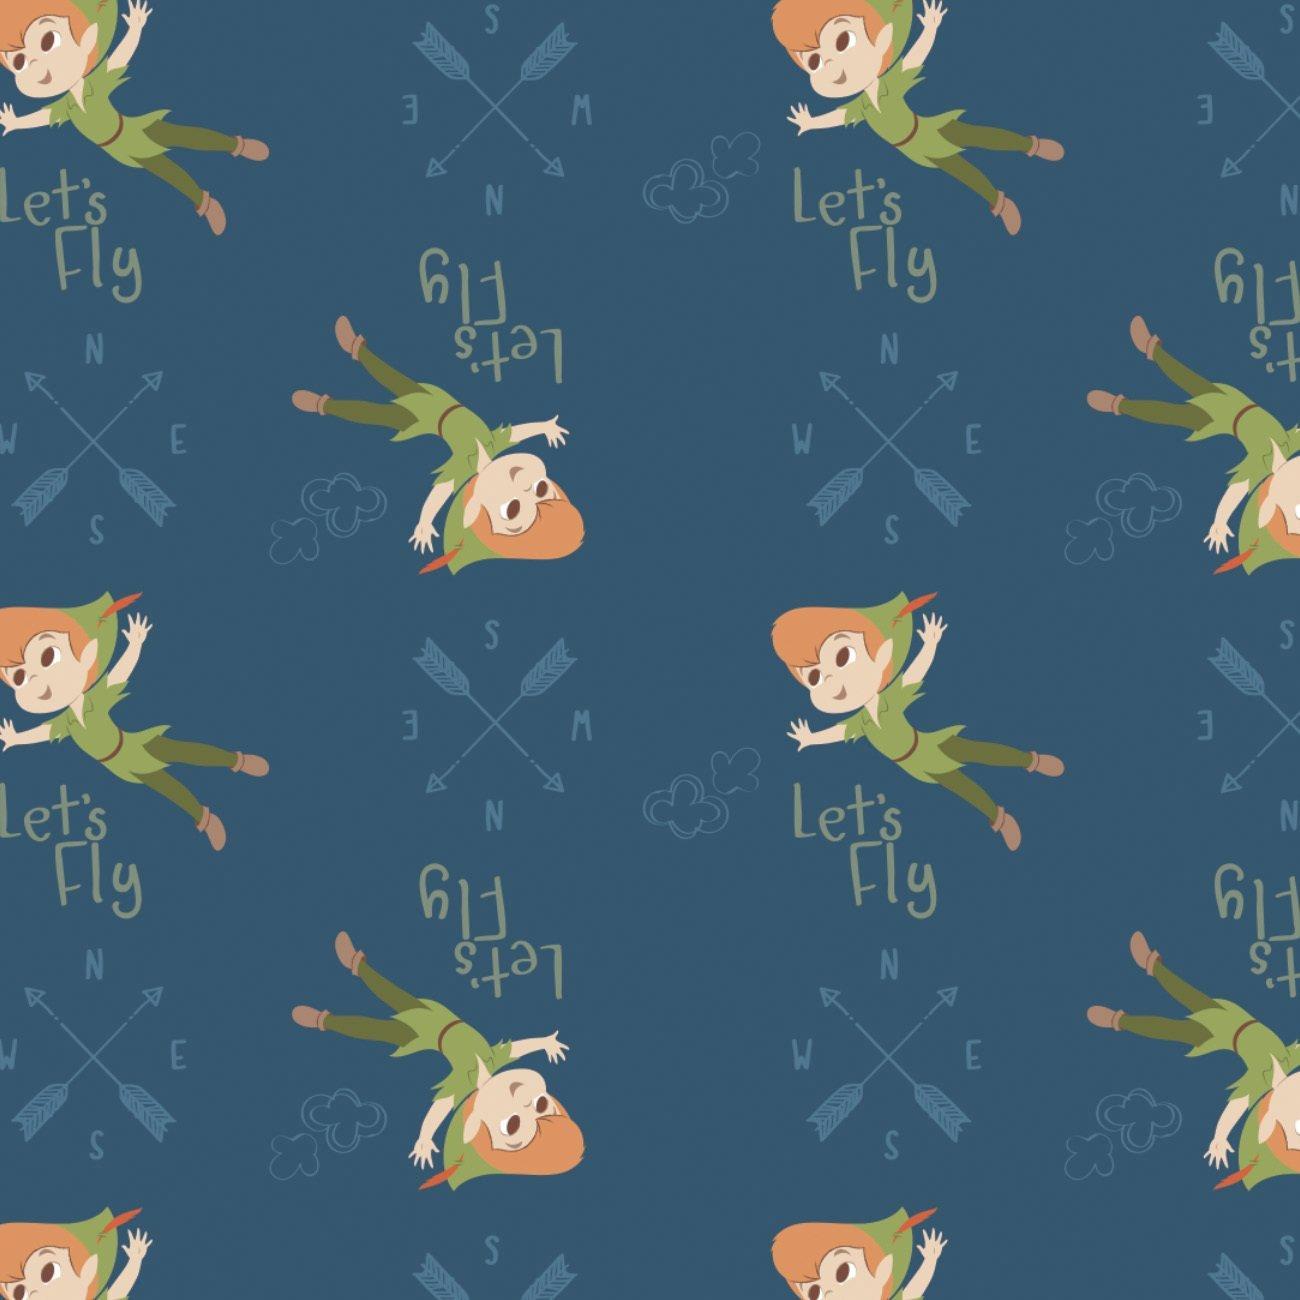 Disney Peter Pan 204-2 Blue Let's Fly